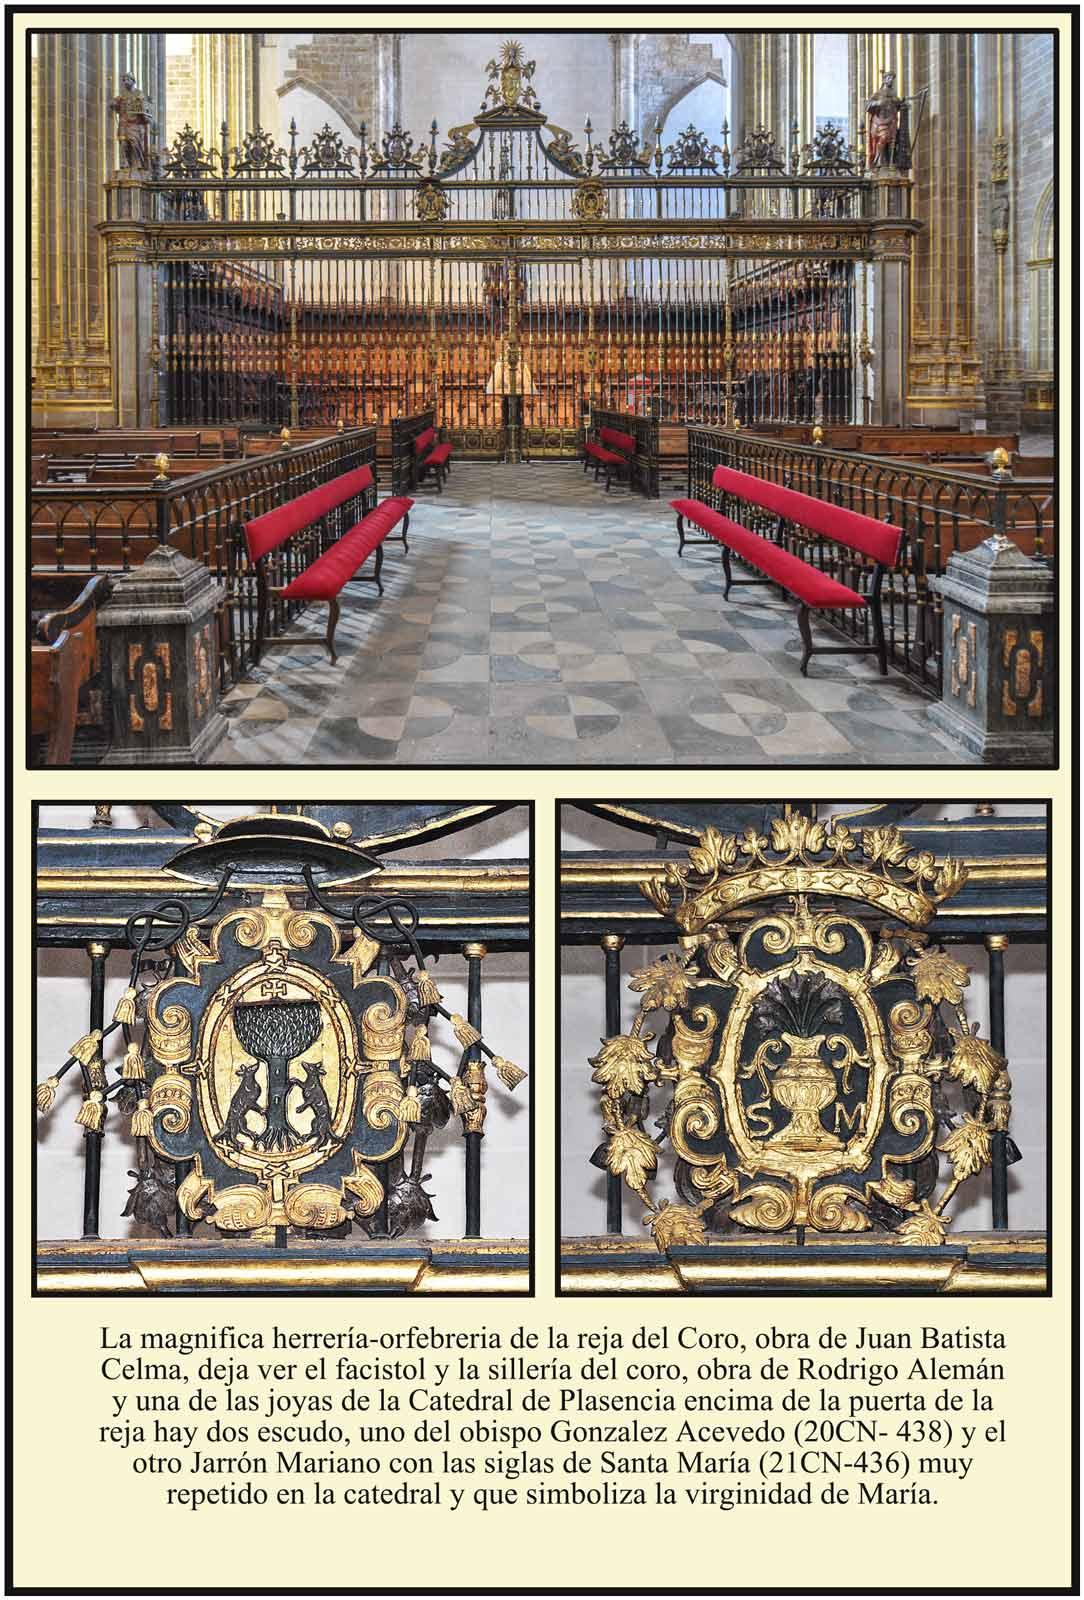 Catedral Dorada Plasencia Reja del coro de Juan Bautista Celma